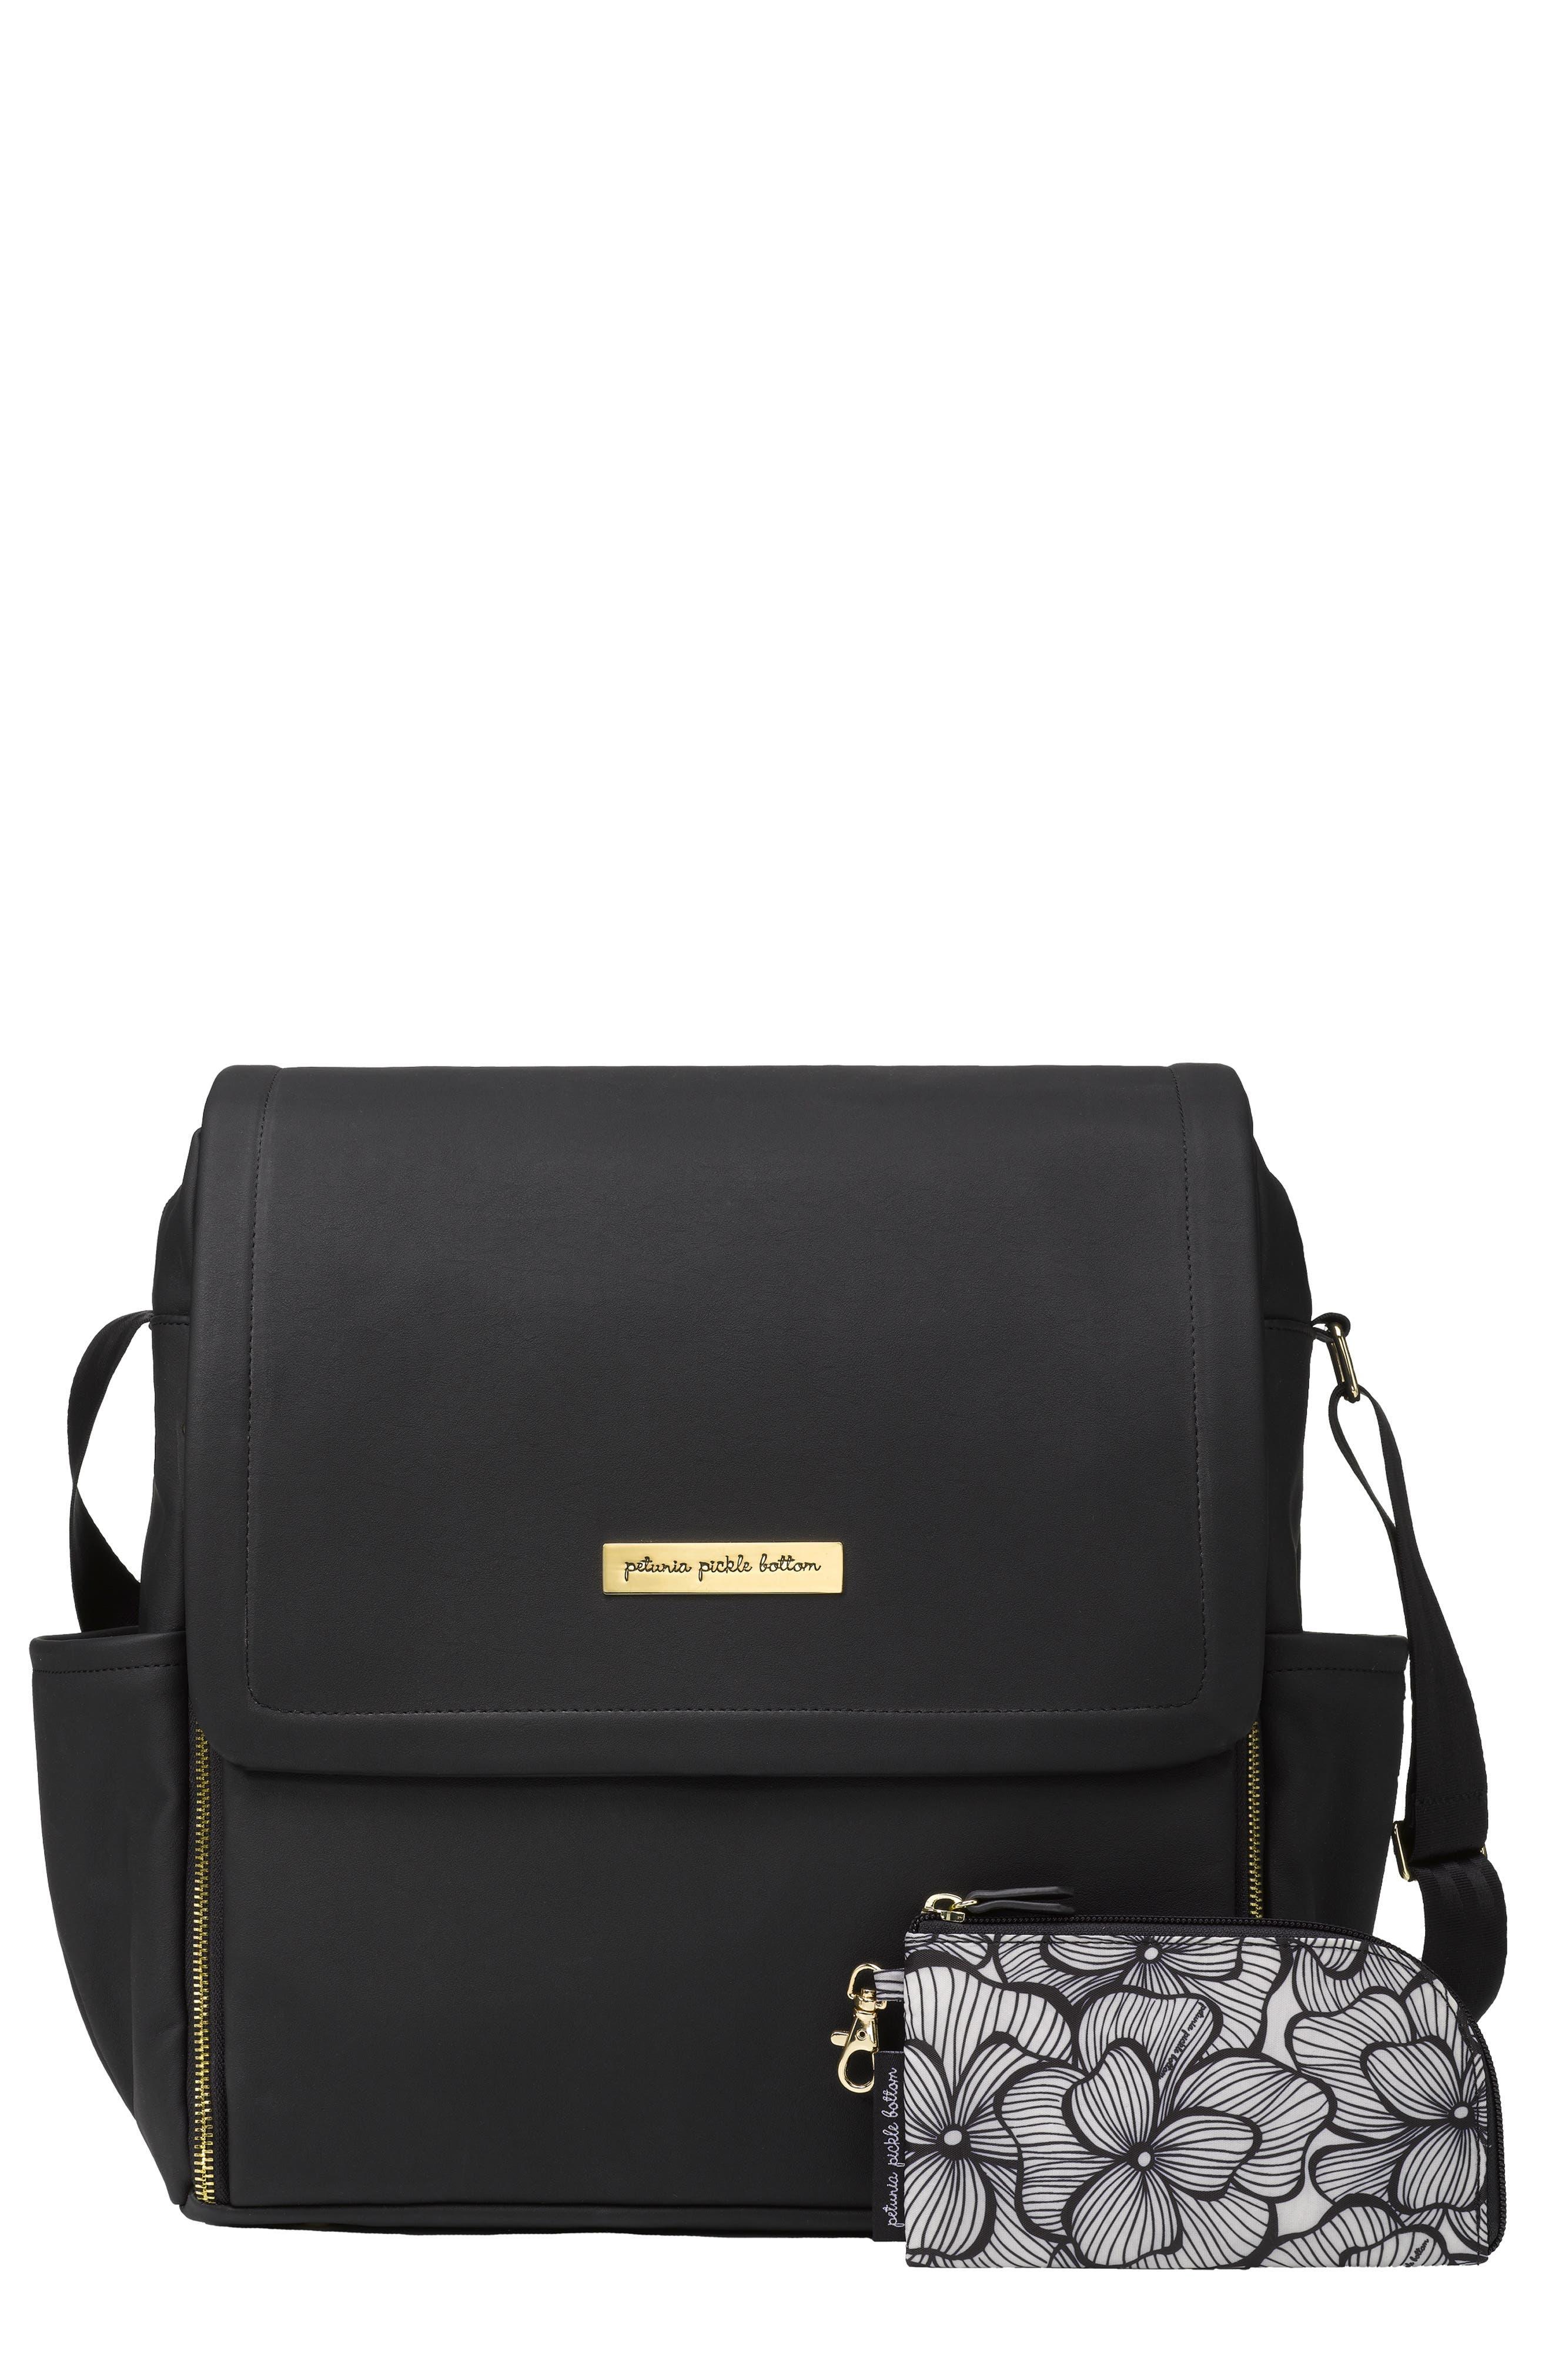 Boxy Backpack Diaper Bag,                             Main thumbnail 1, color,                             BLACK MATTE LEATHERETTE